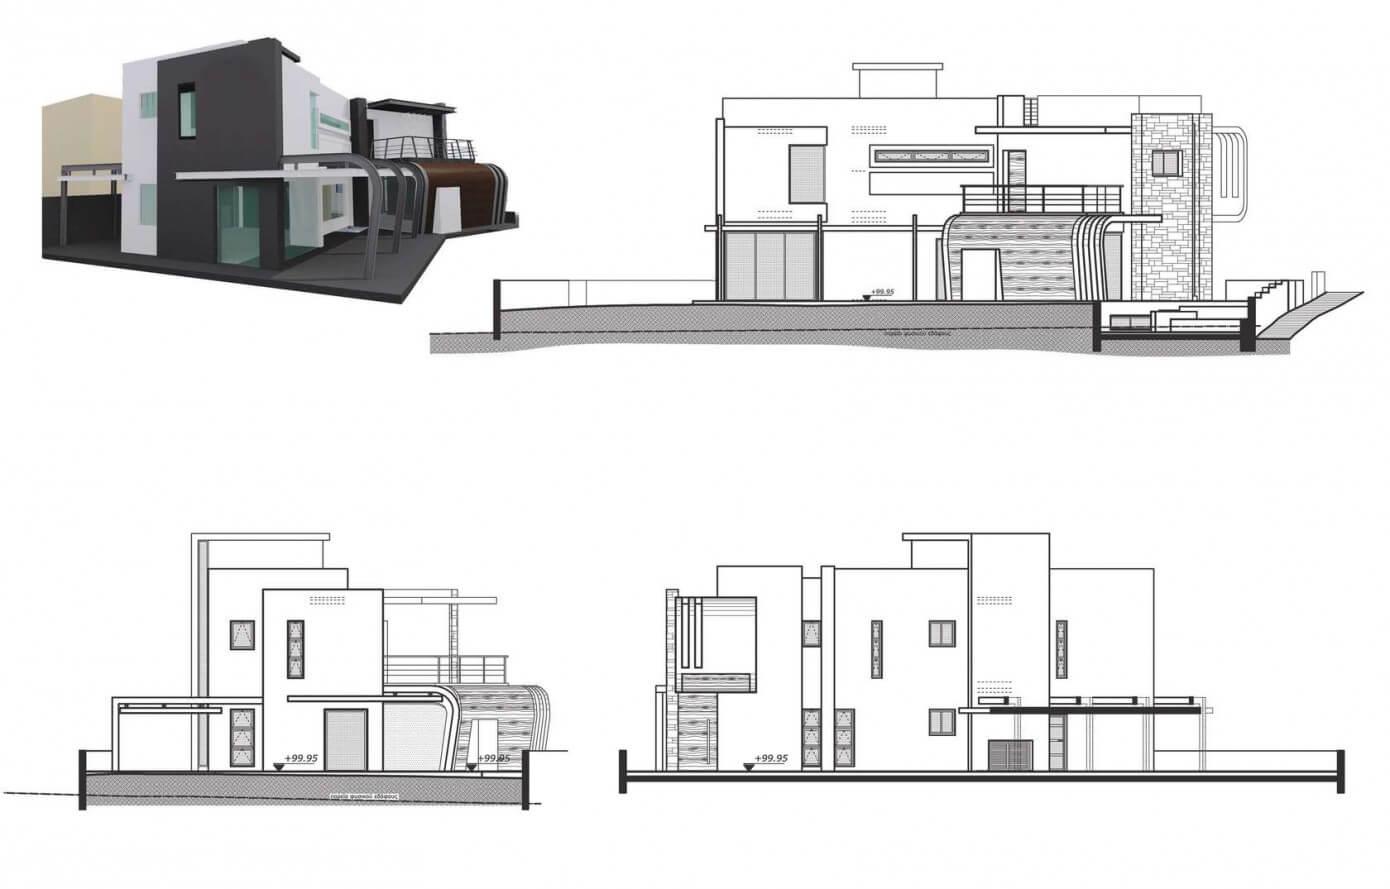 Modelo 3d y alzados de casa moderna de dos plantas for Planos y fachadas de casas pequenas de dos plantas